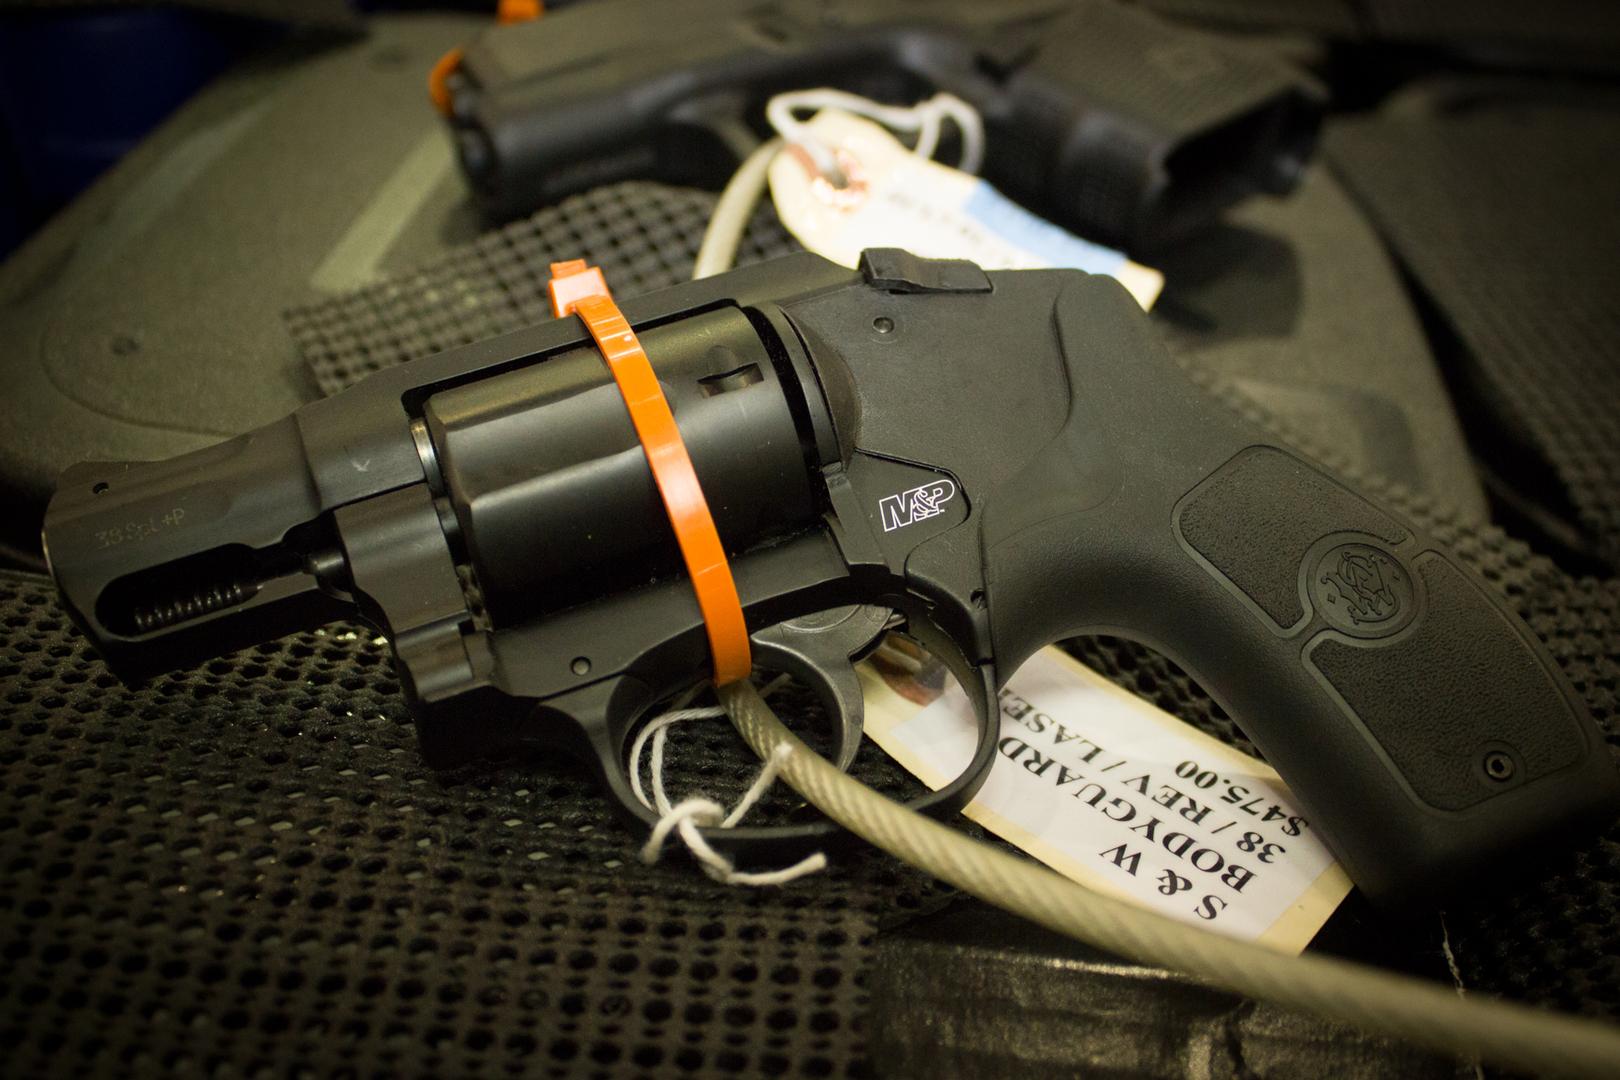 C & E Gun Shows - Guns, Gun Show, Sporting Goods, Outdoor Sports